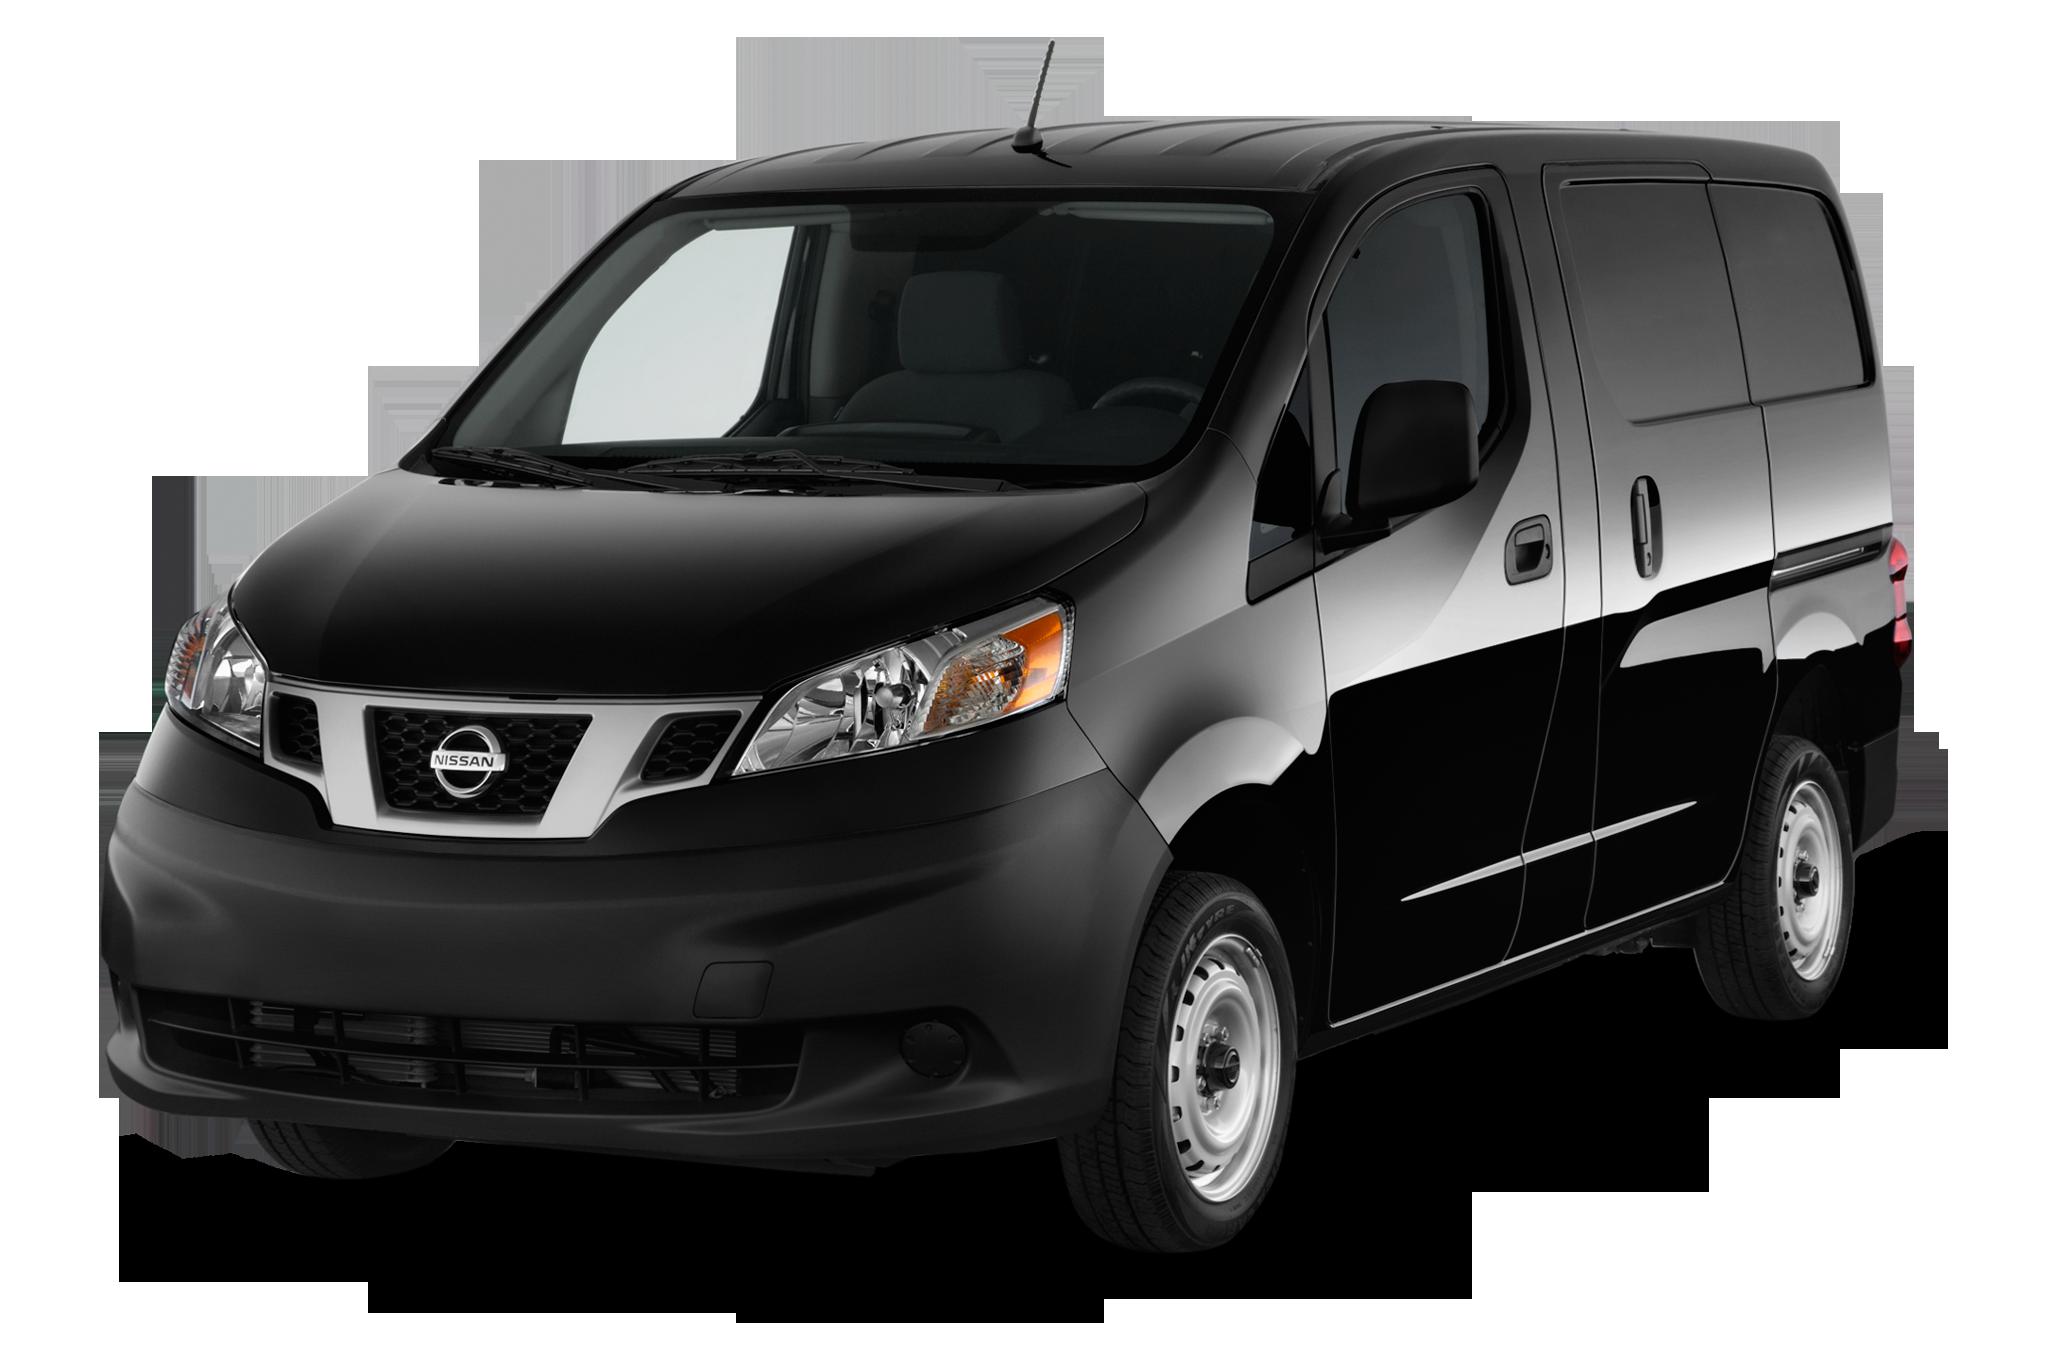 Toyota Rav4 2015 International Price Overview